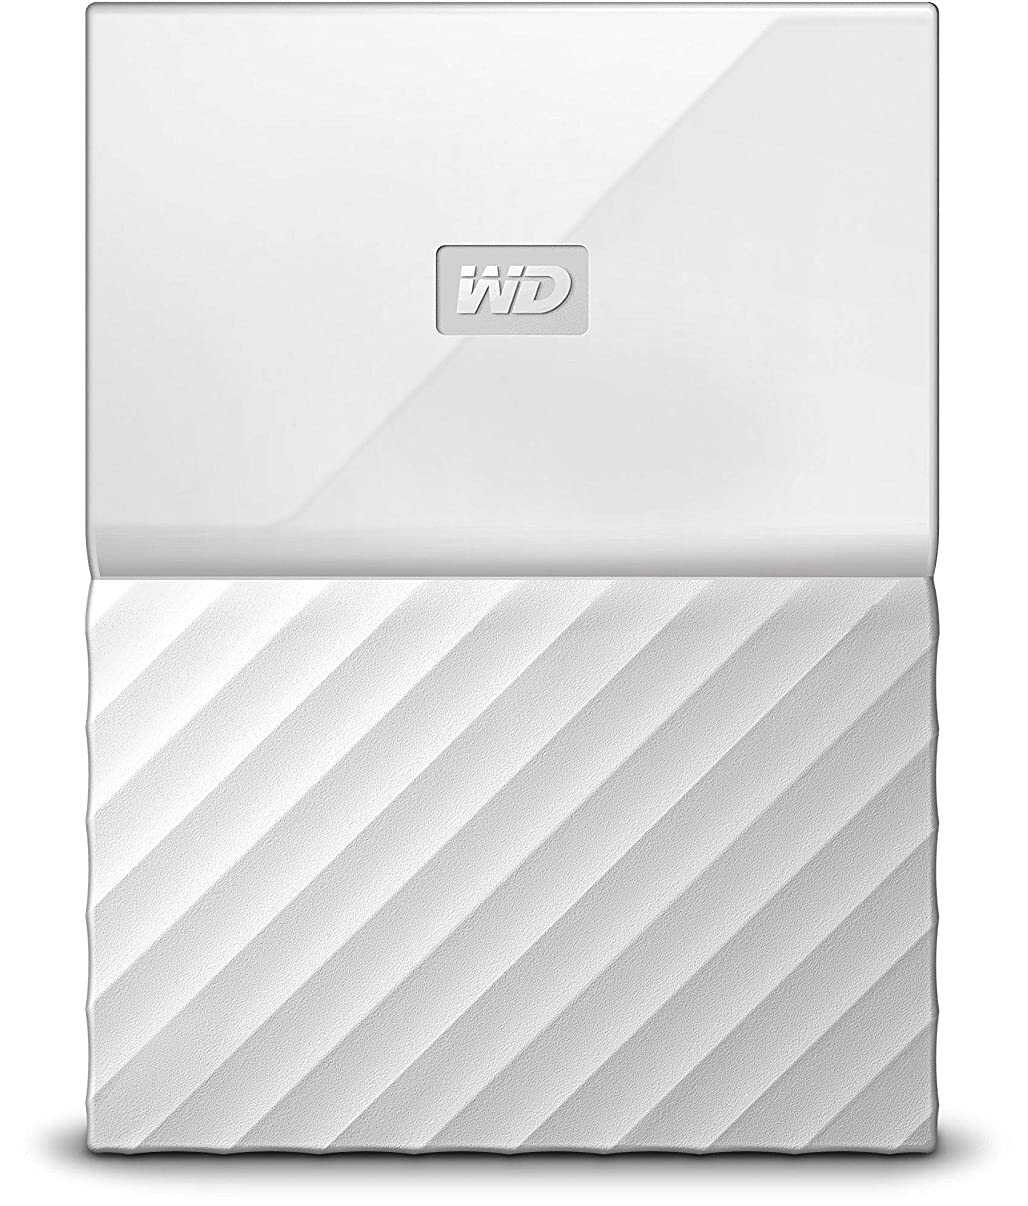 WD 4TB White My Passport? Portable External Hard Drive - USB 3.0 - WDBYFT0040BWT-WESN